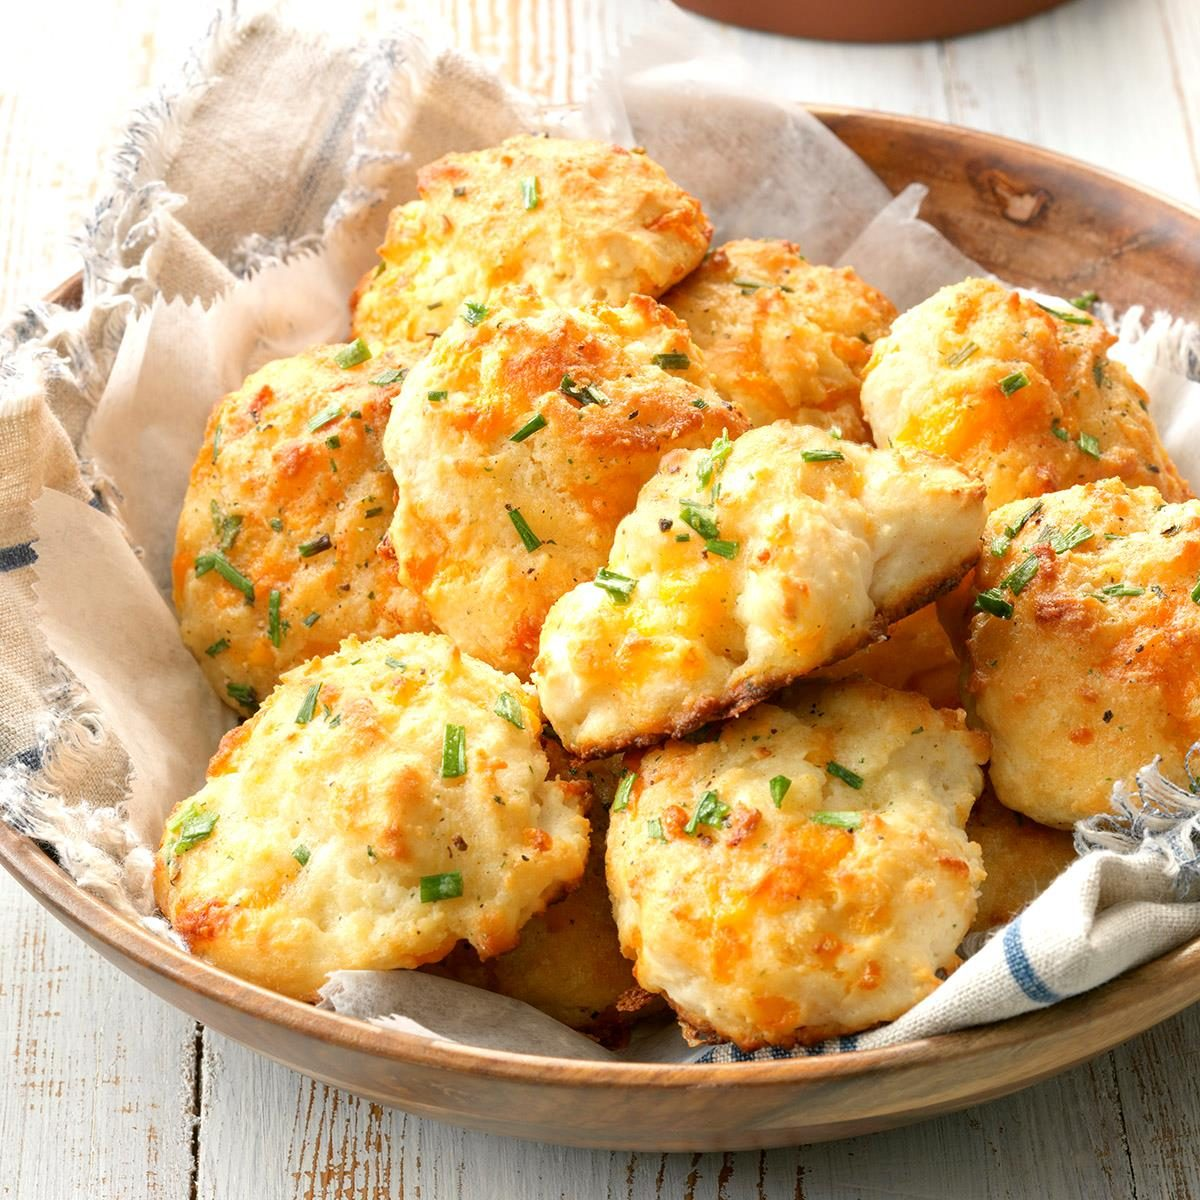 Cheese & Garlic Biscuits